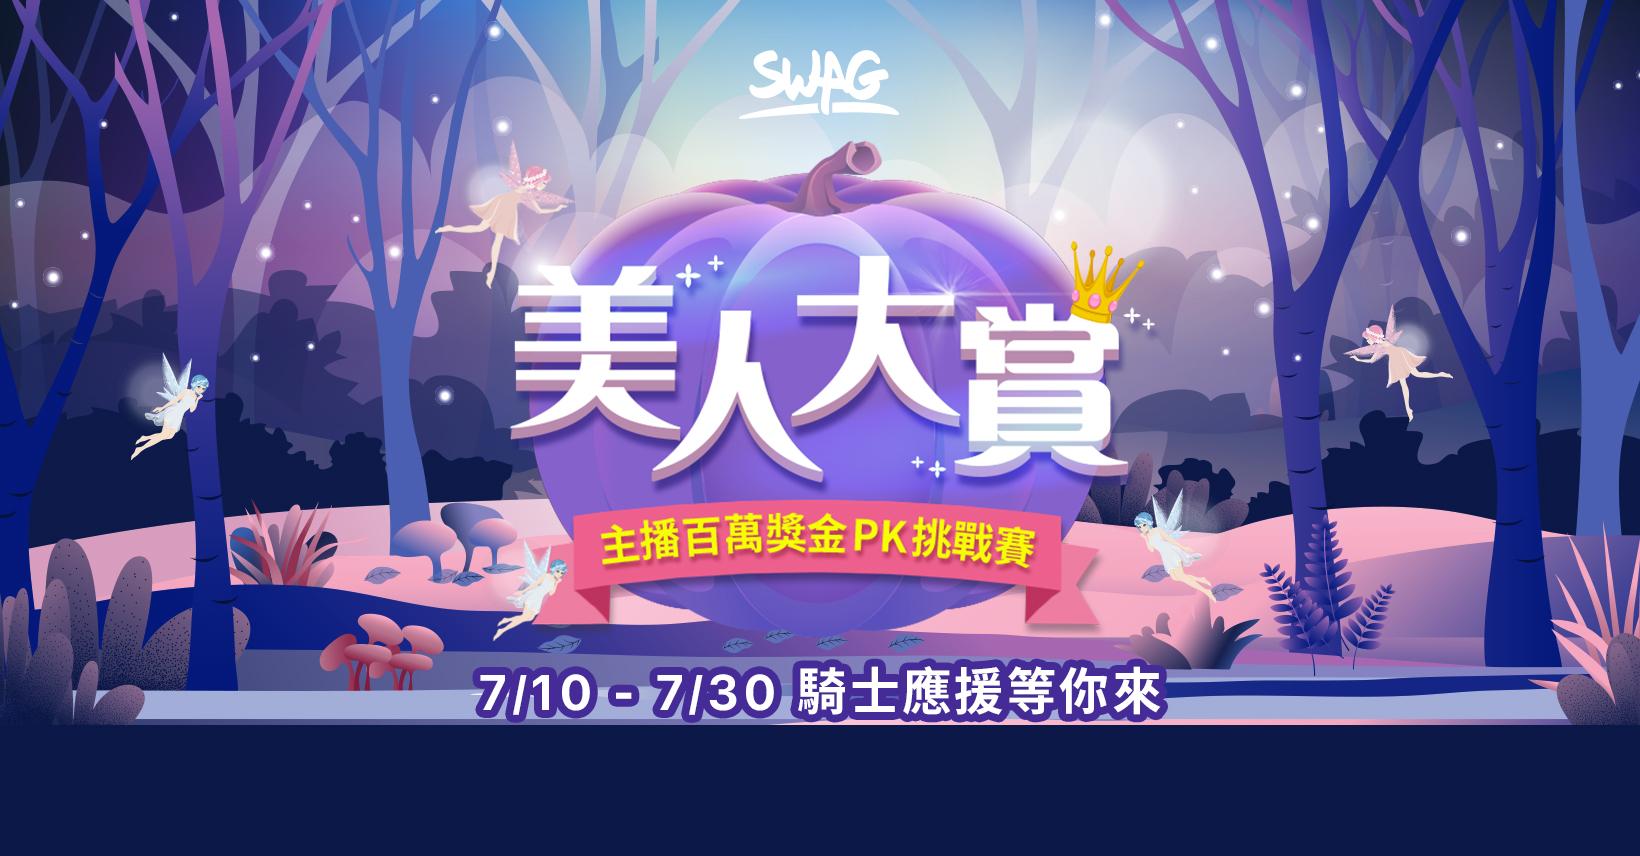 SWAG 美人大賞!主播百萬獎金 PK 挑戰賽!